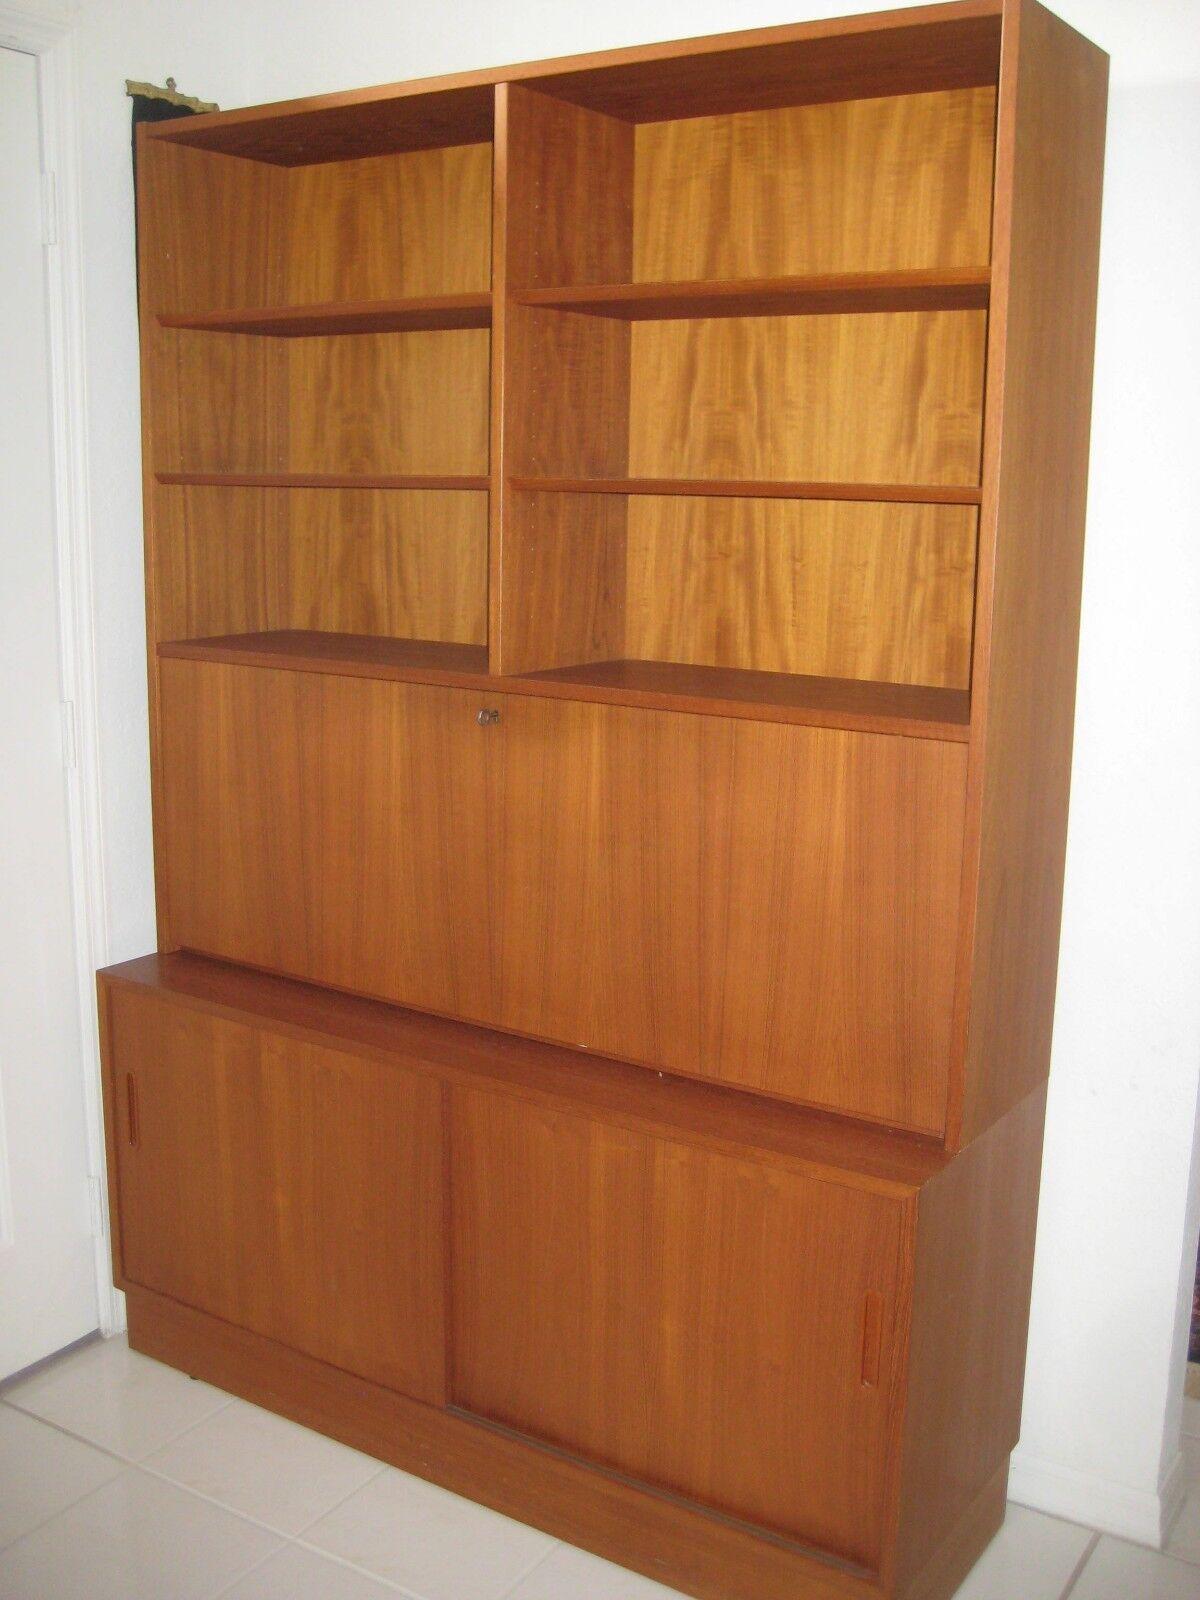 Image of: Danish Mid Century Modern Teak Bookcase For Sale Online Ebay